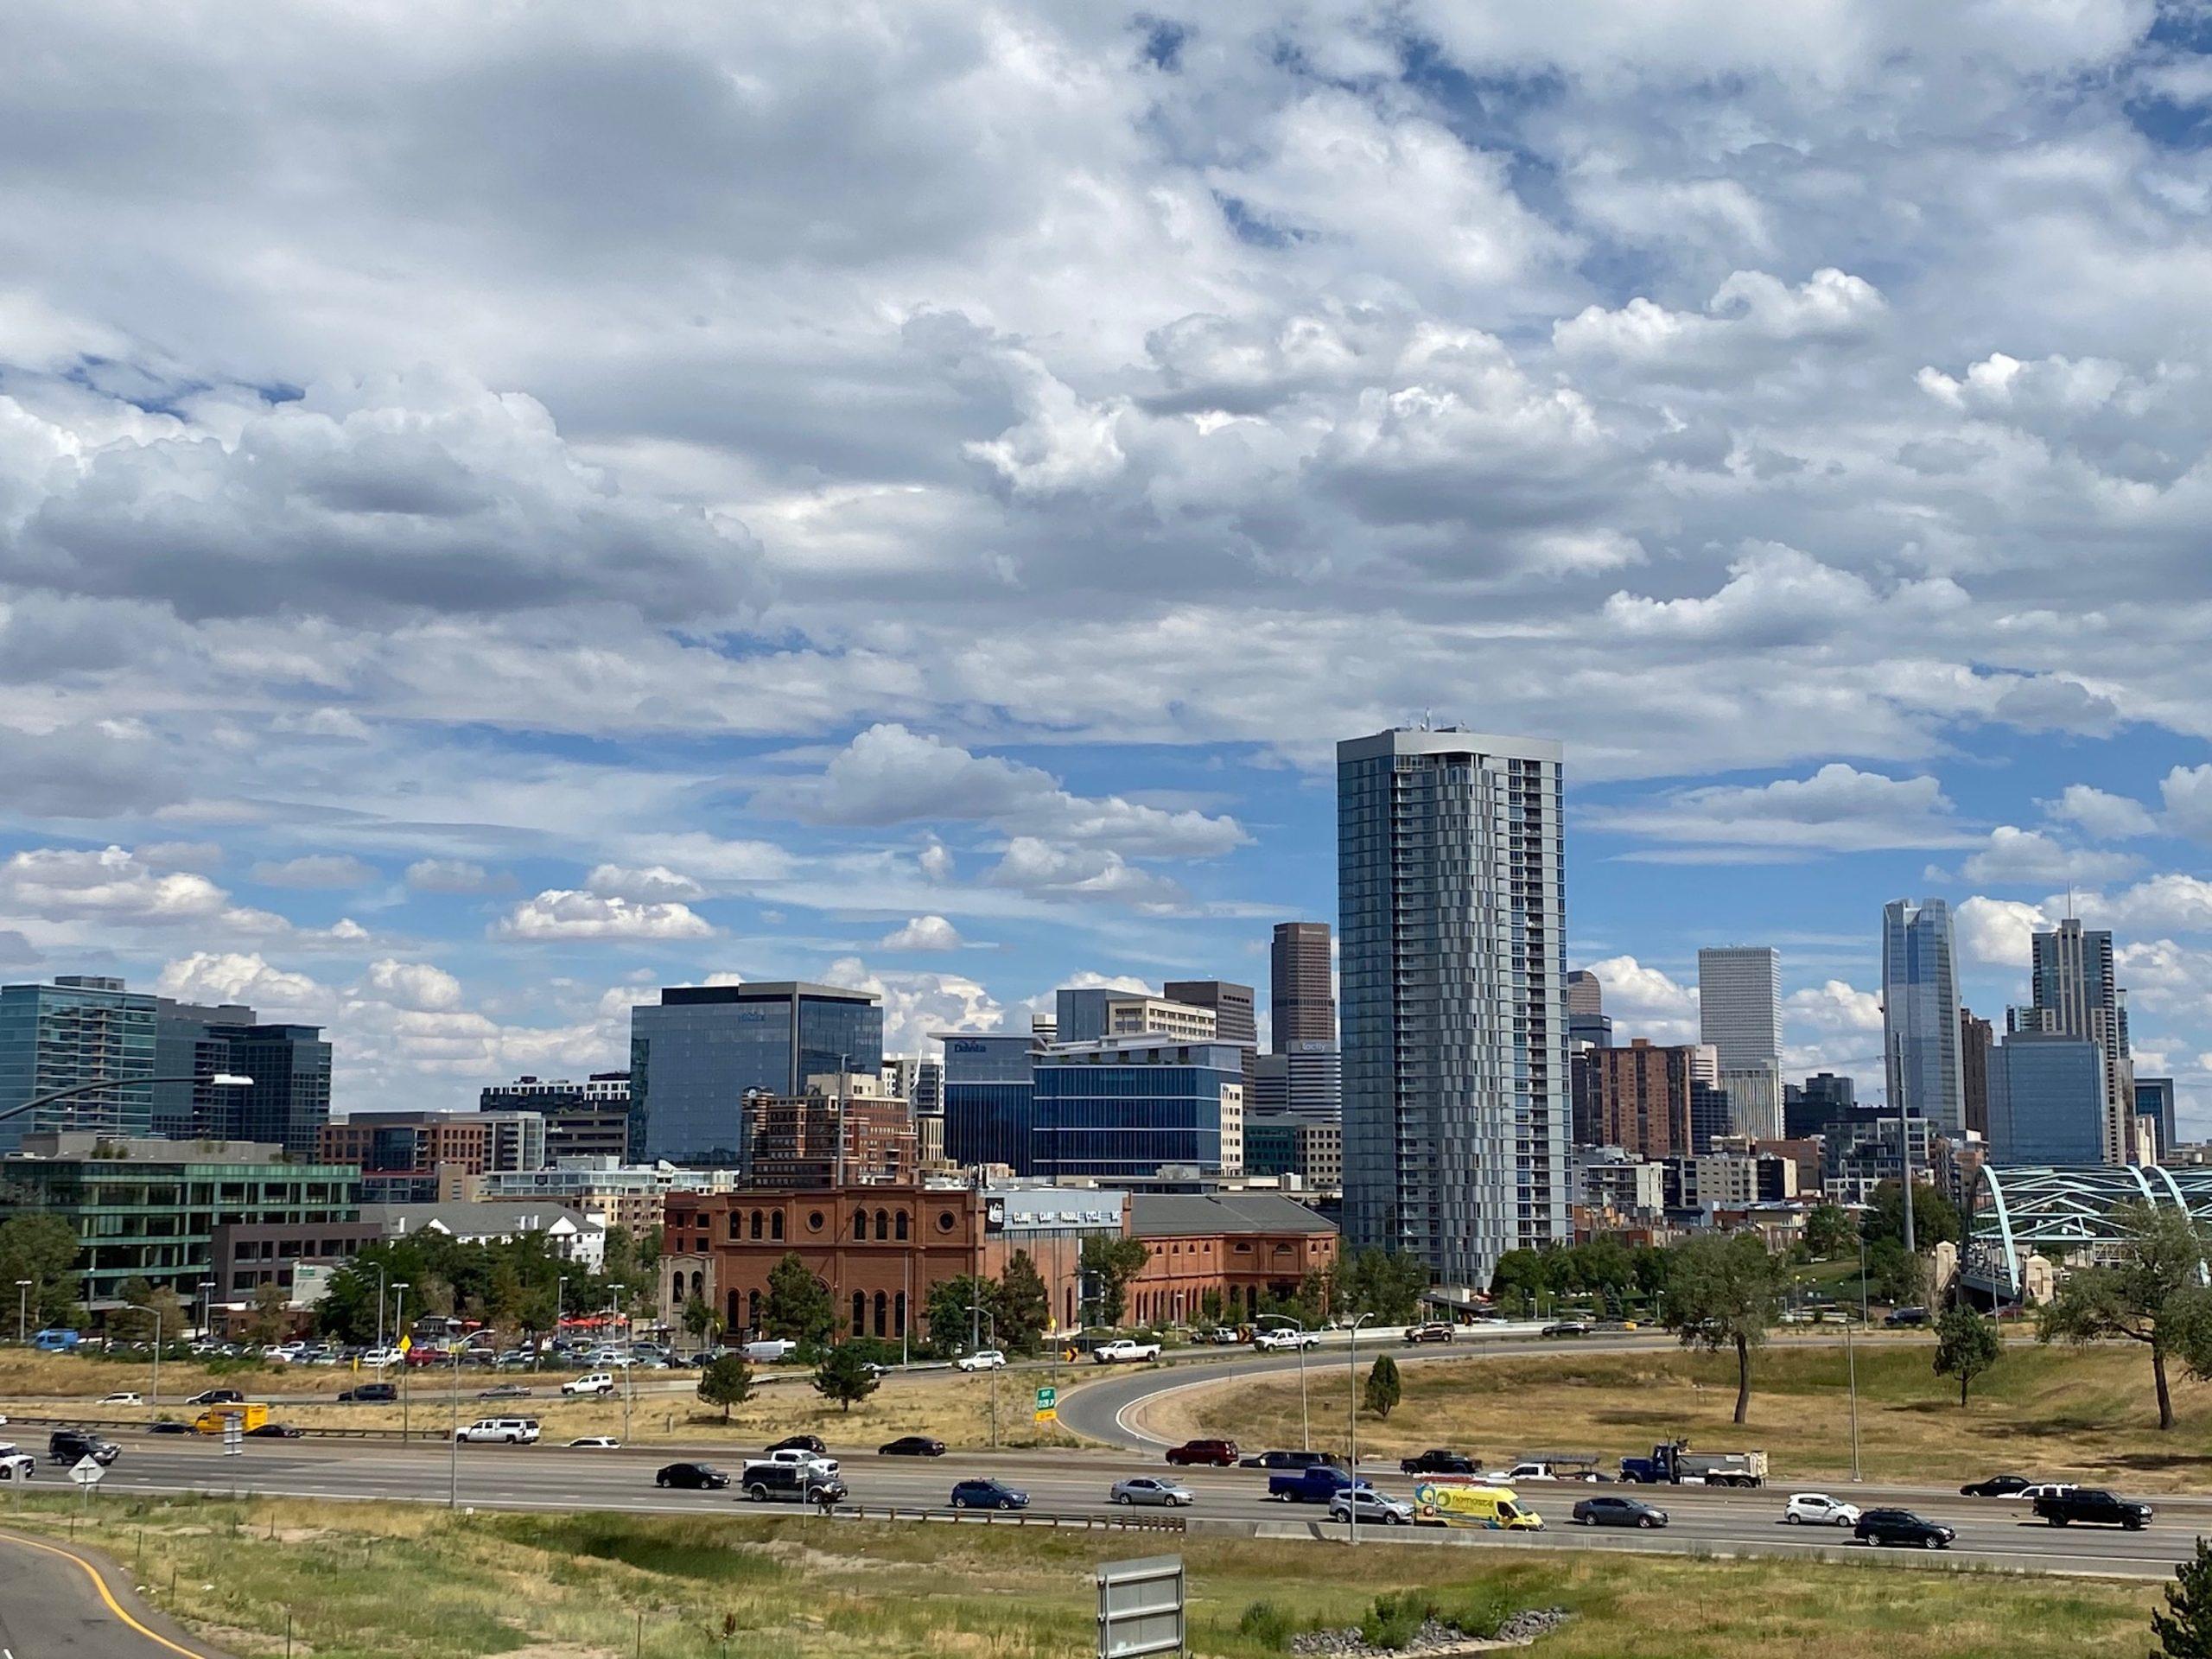 Colorado's buildings are a 6 billion square-foot climate change problem